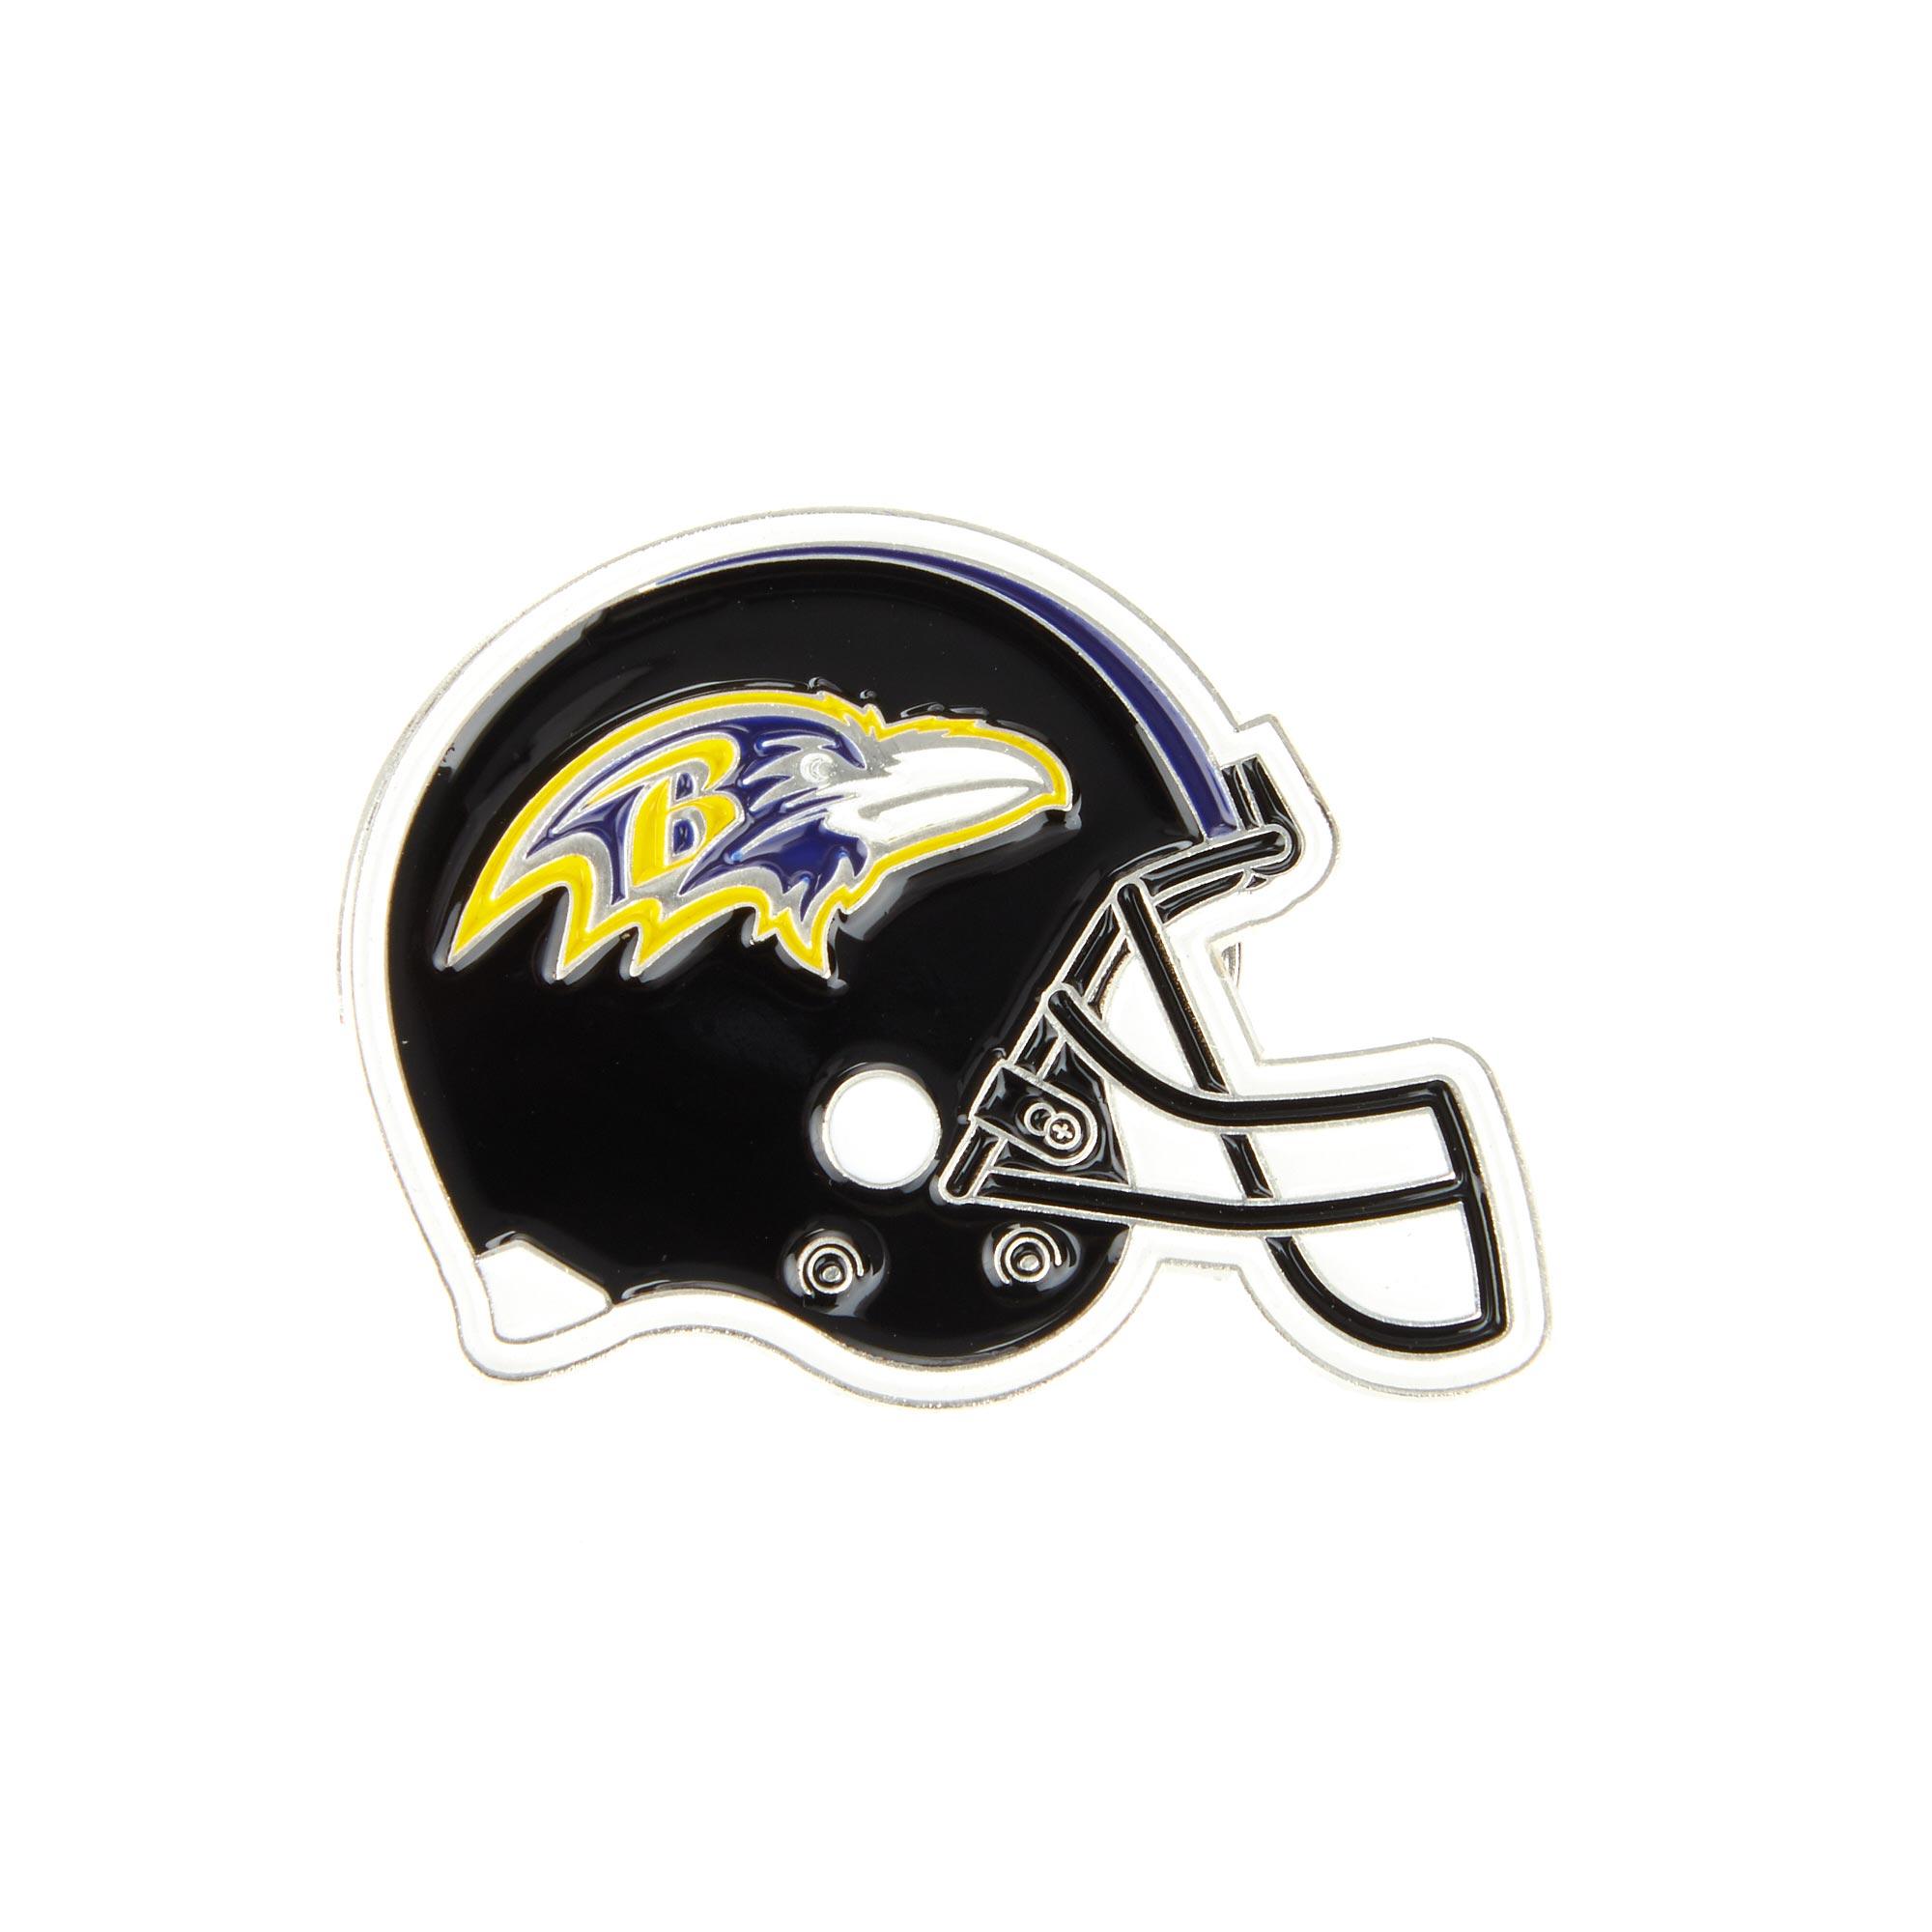 Baltimore Ravens Helmet Pin Badge